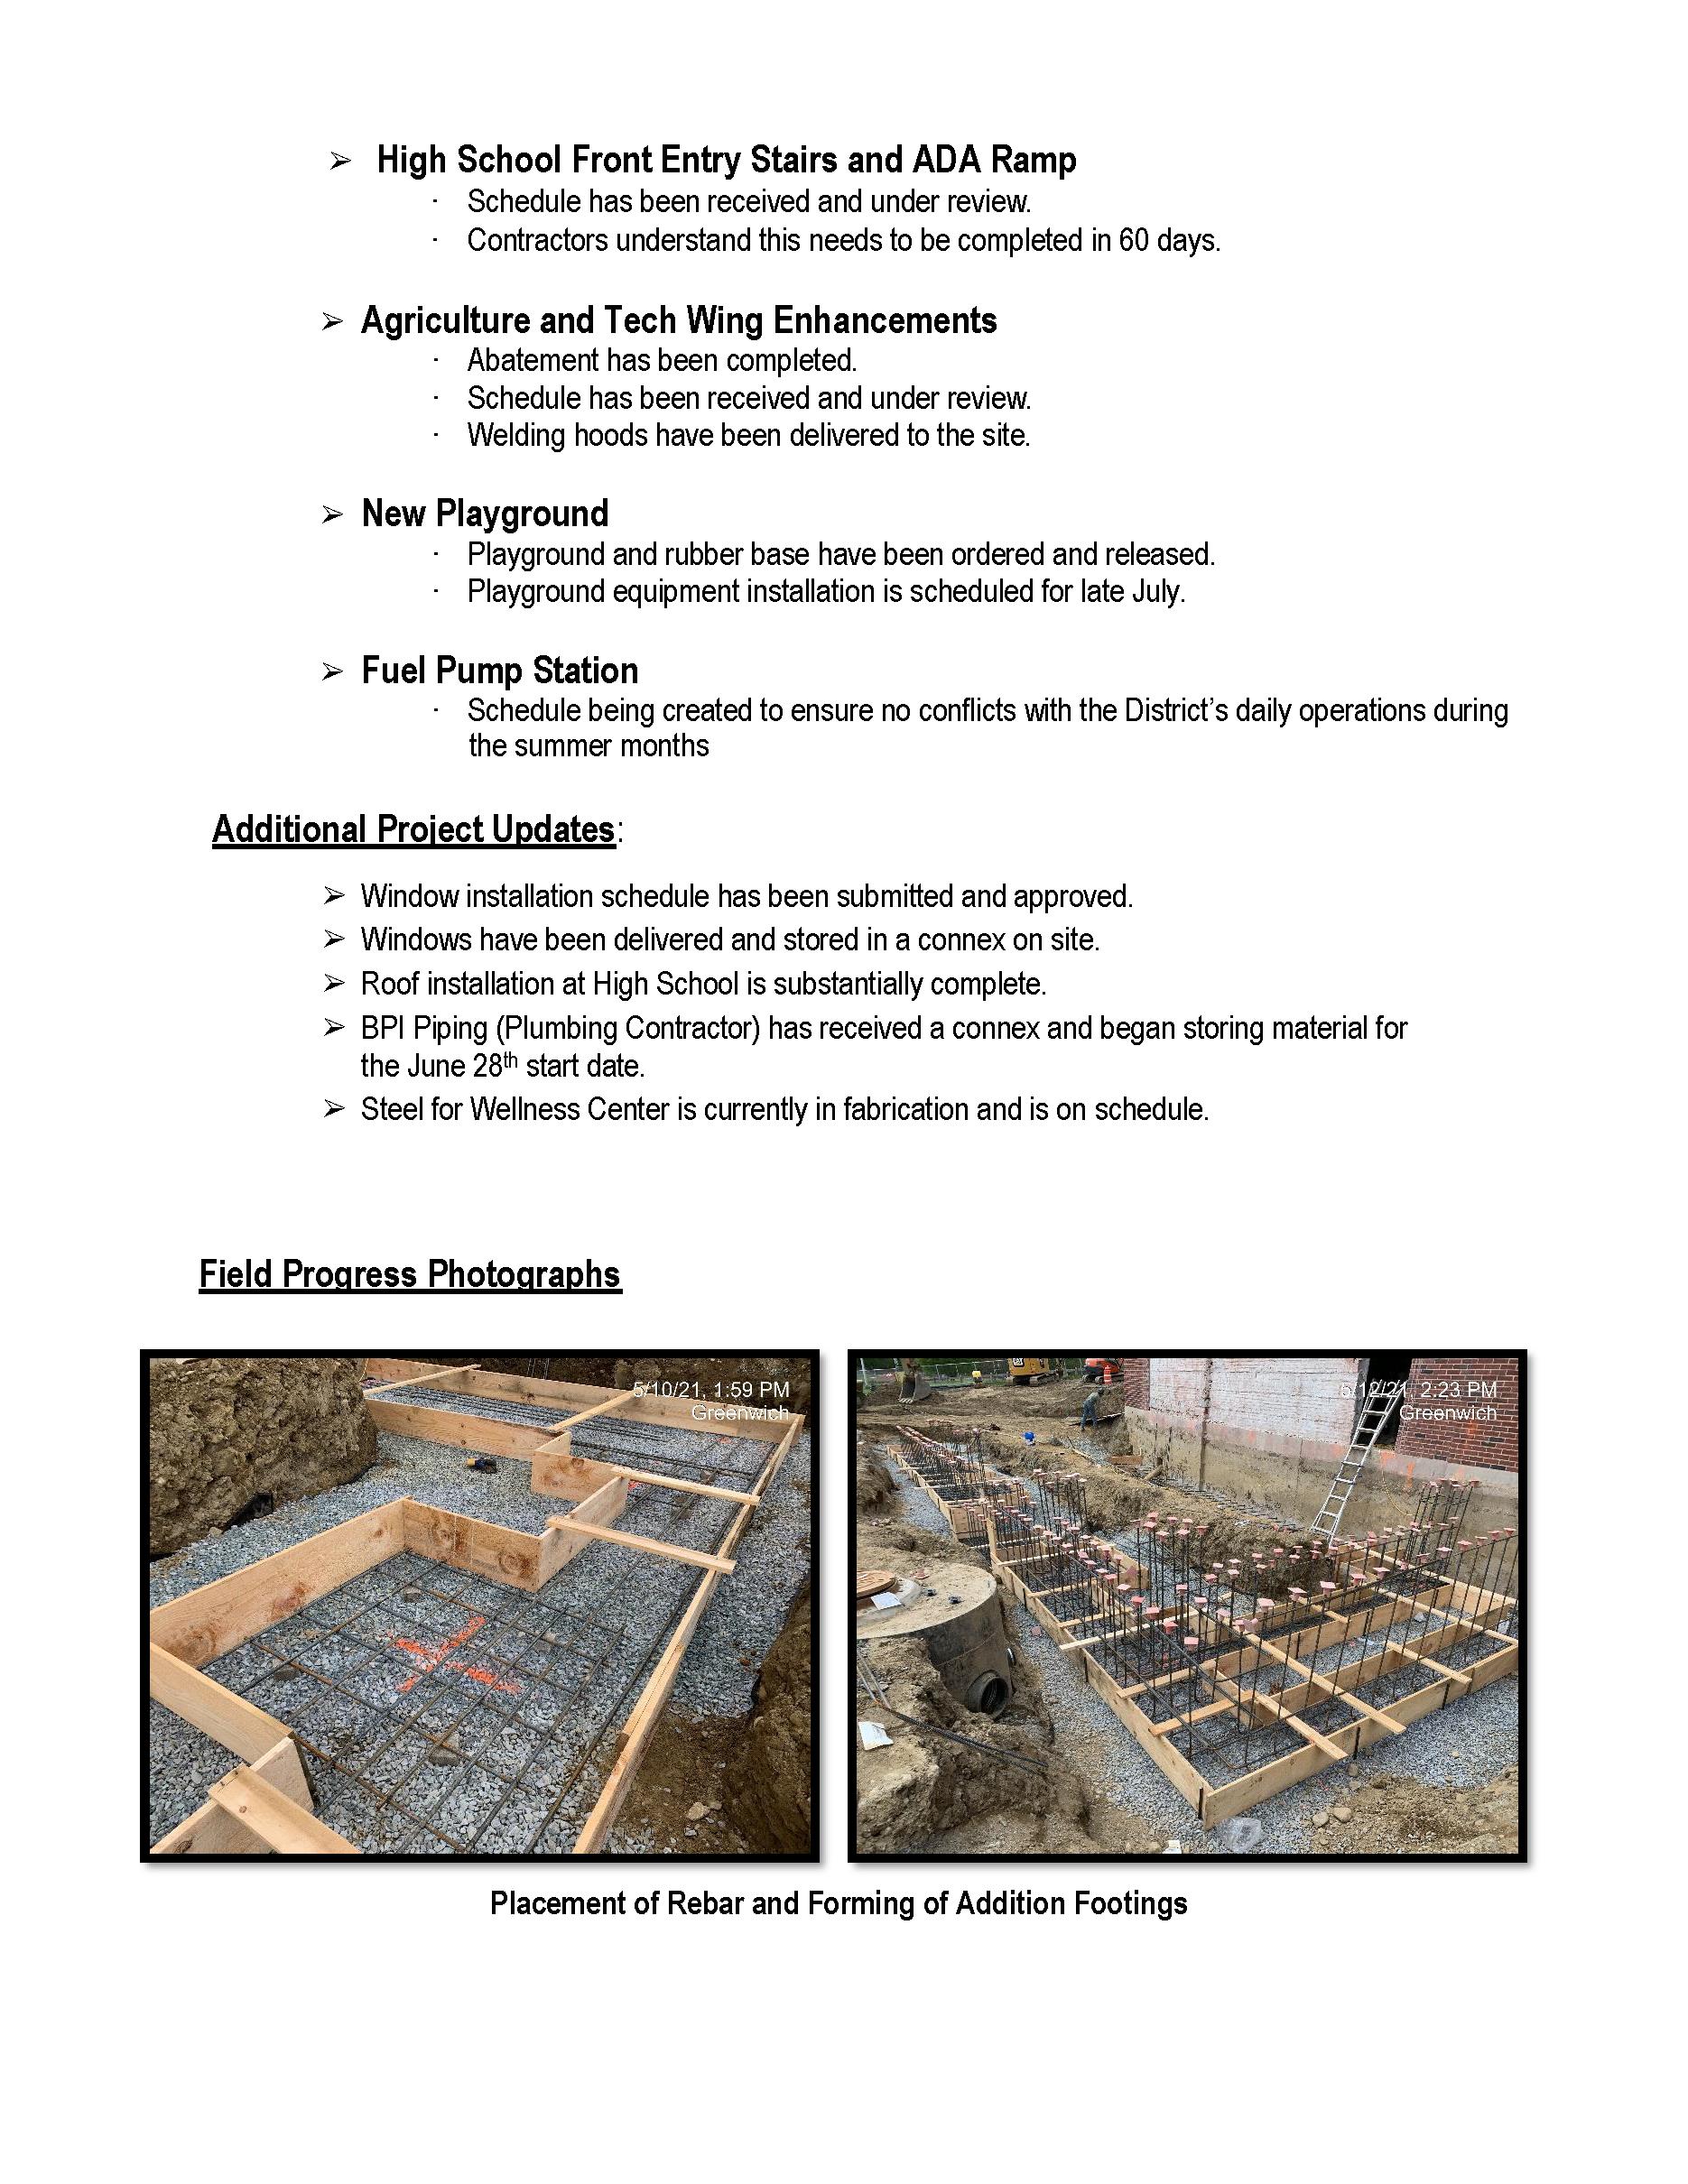 June Progress Report Page 2